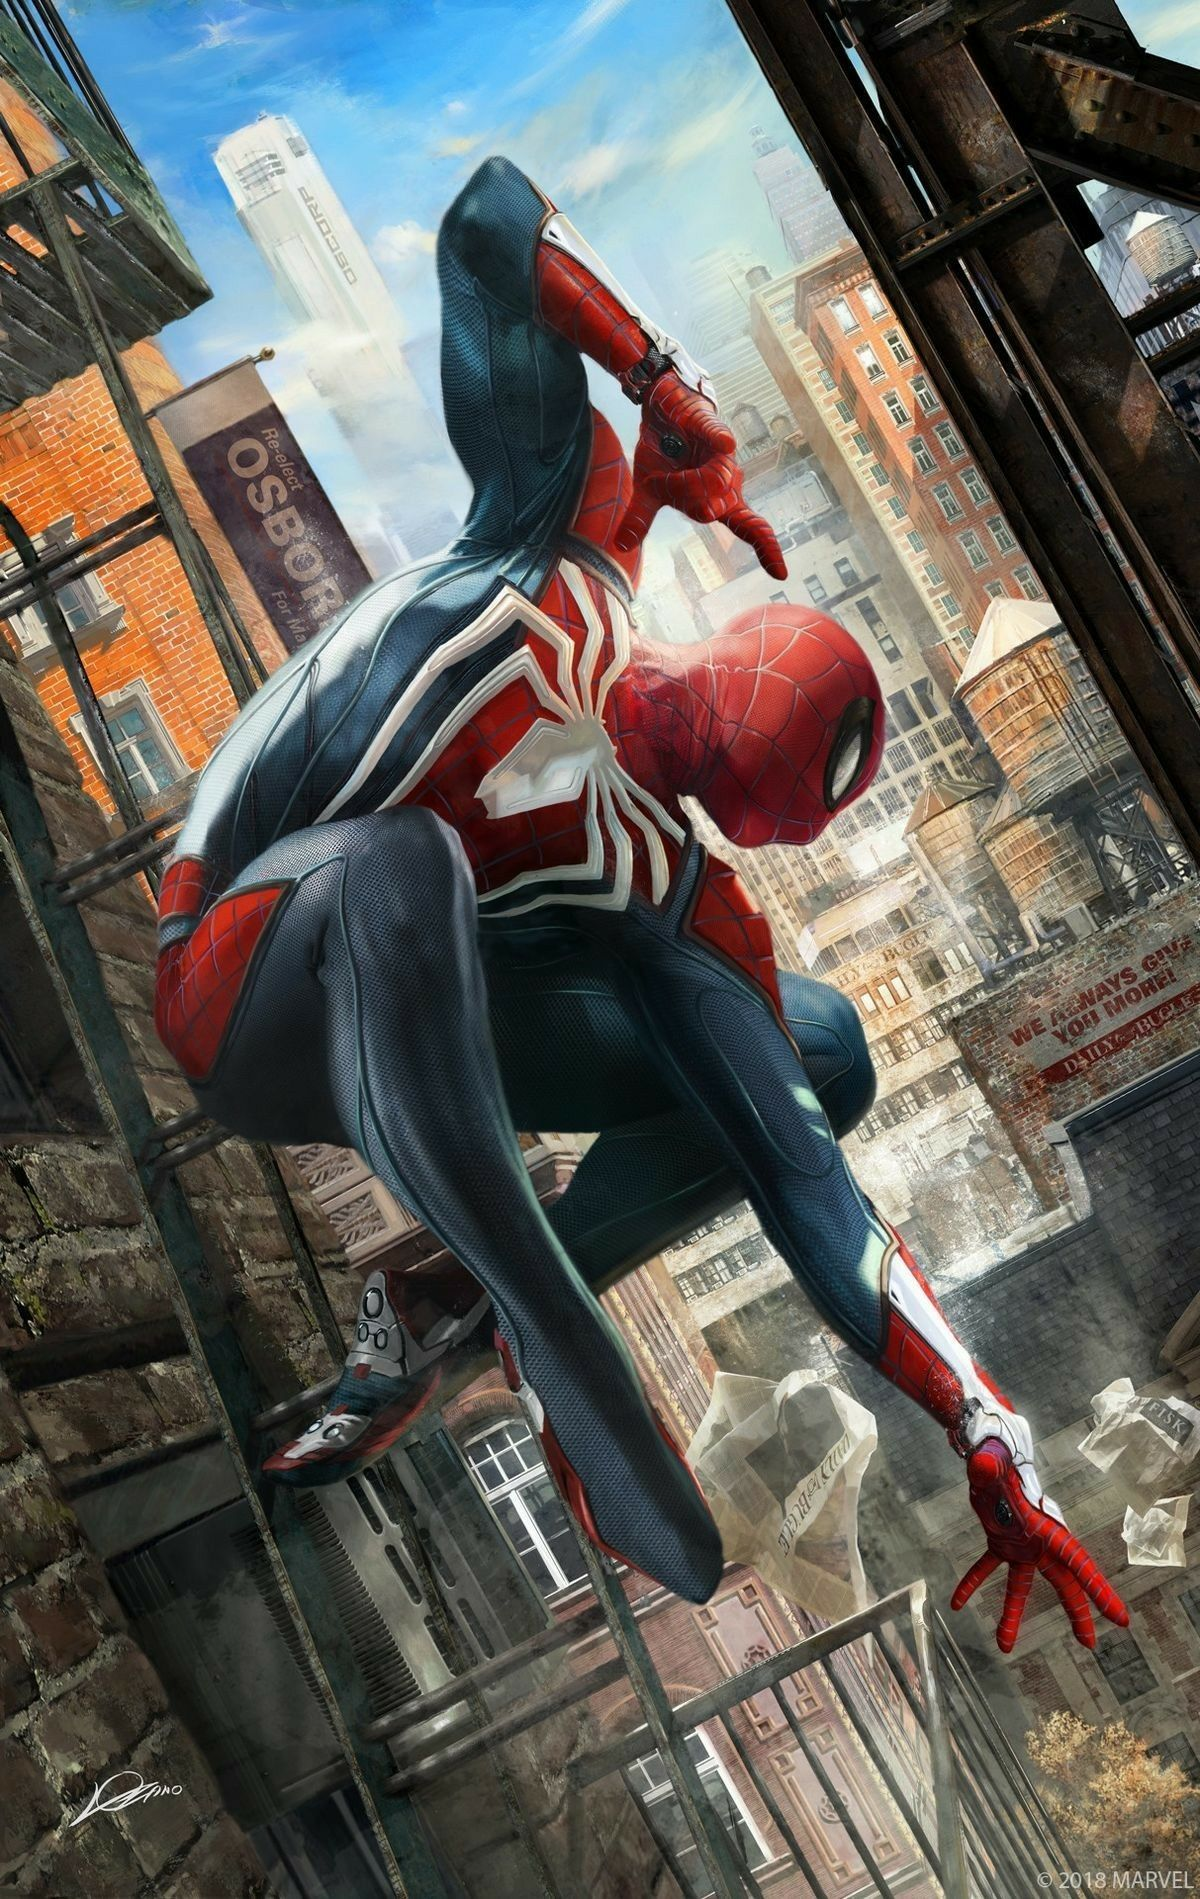 Pin by Lakshay Panwar on Spiderman Spider man